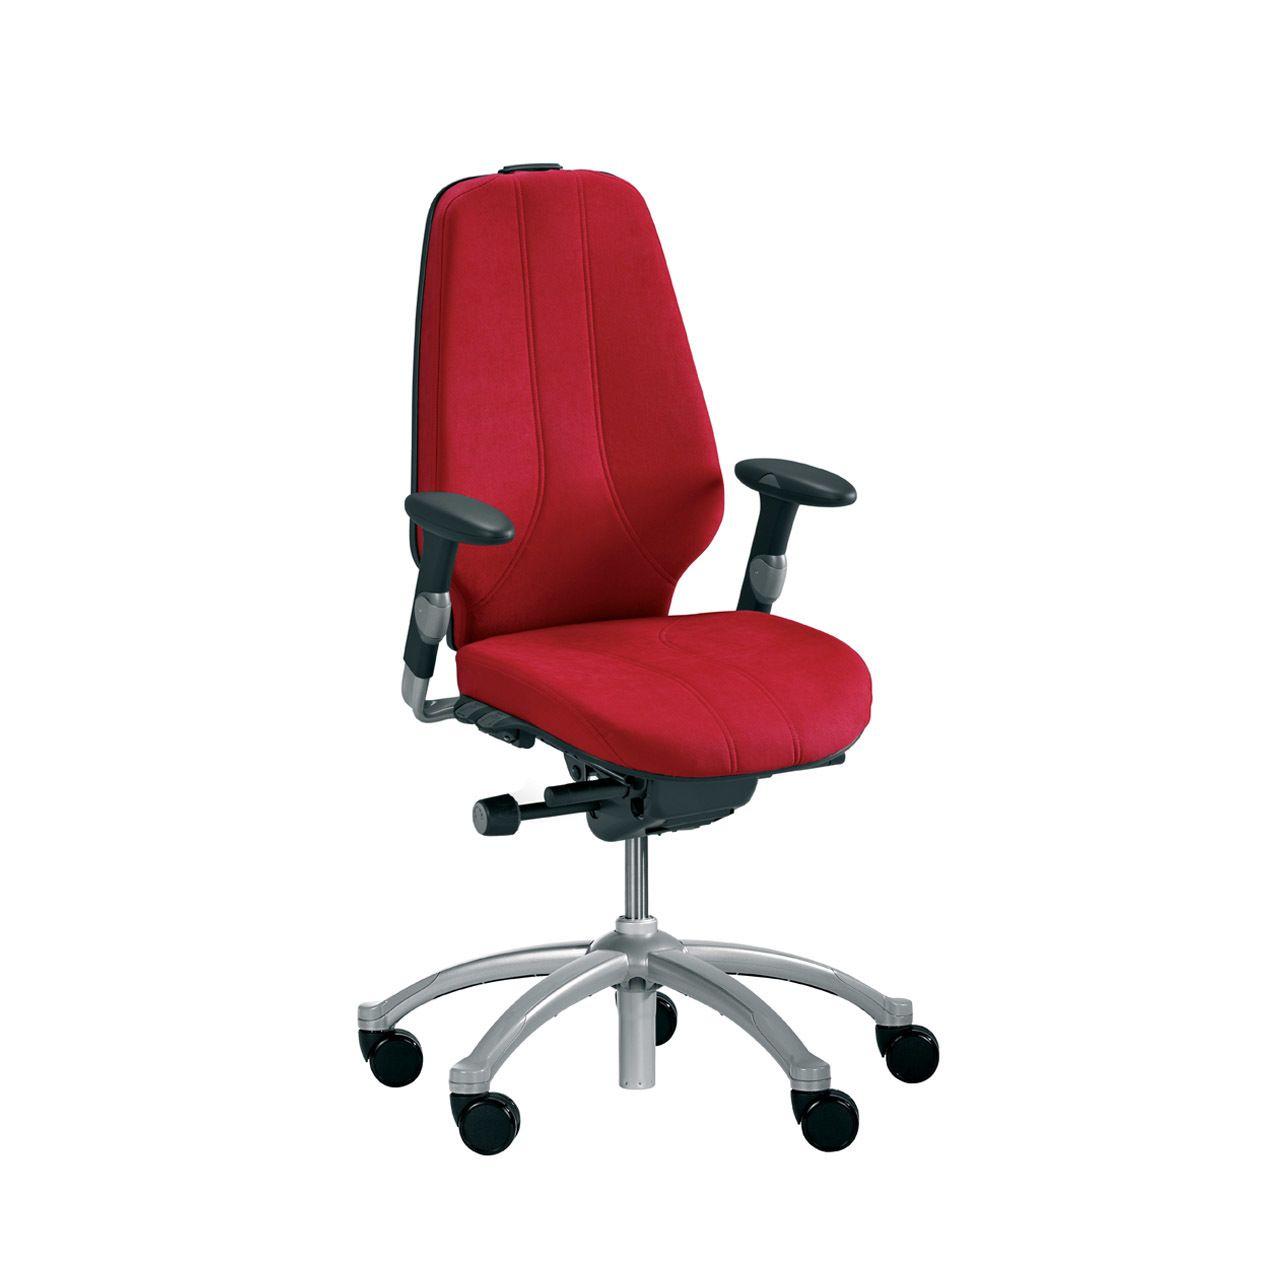 RH Logic 400 XL Ergonomische bureaustoel rood